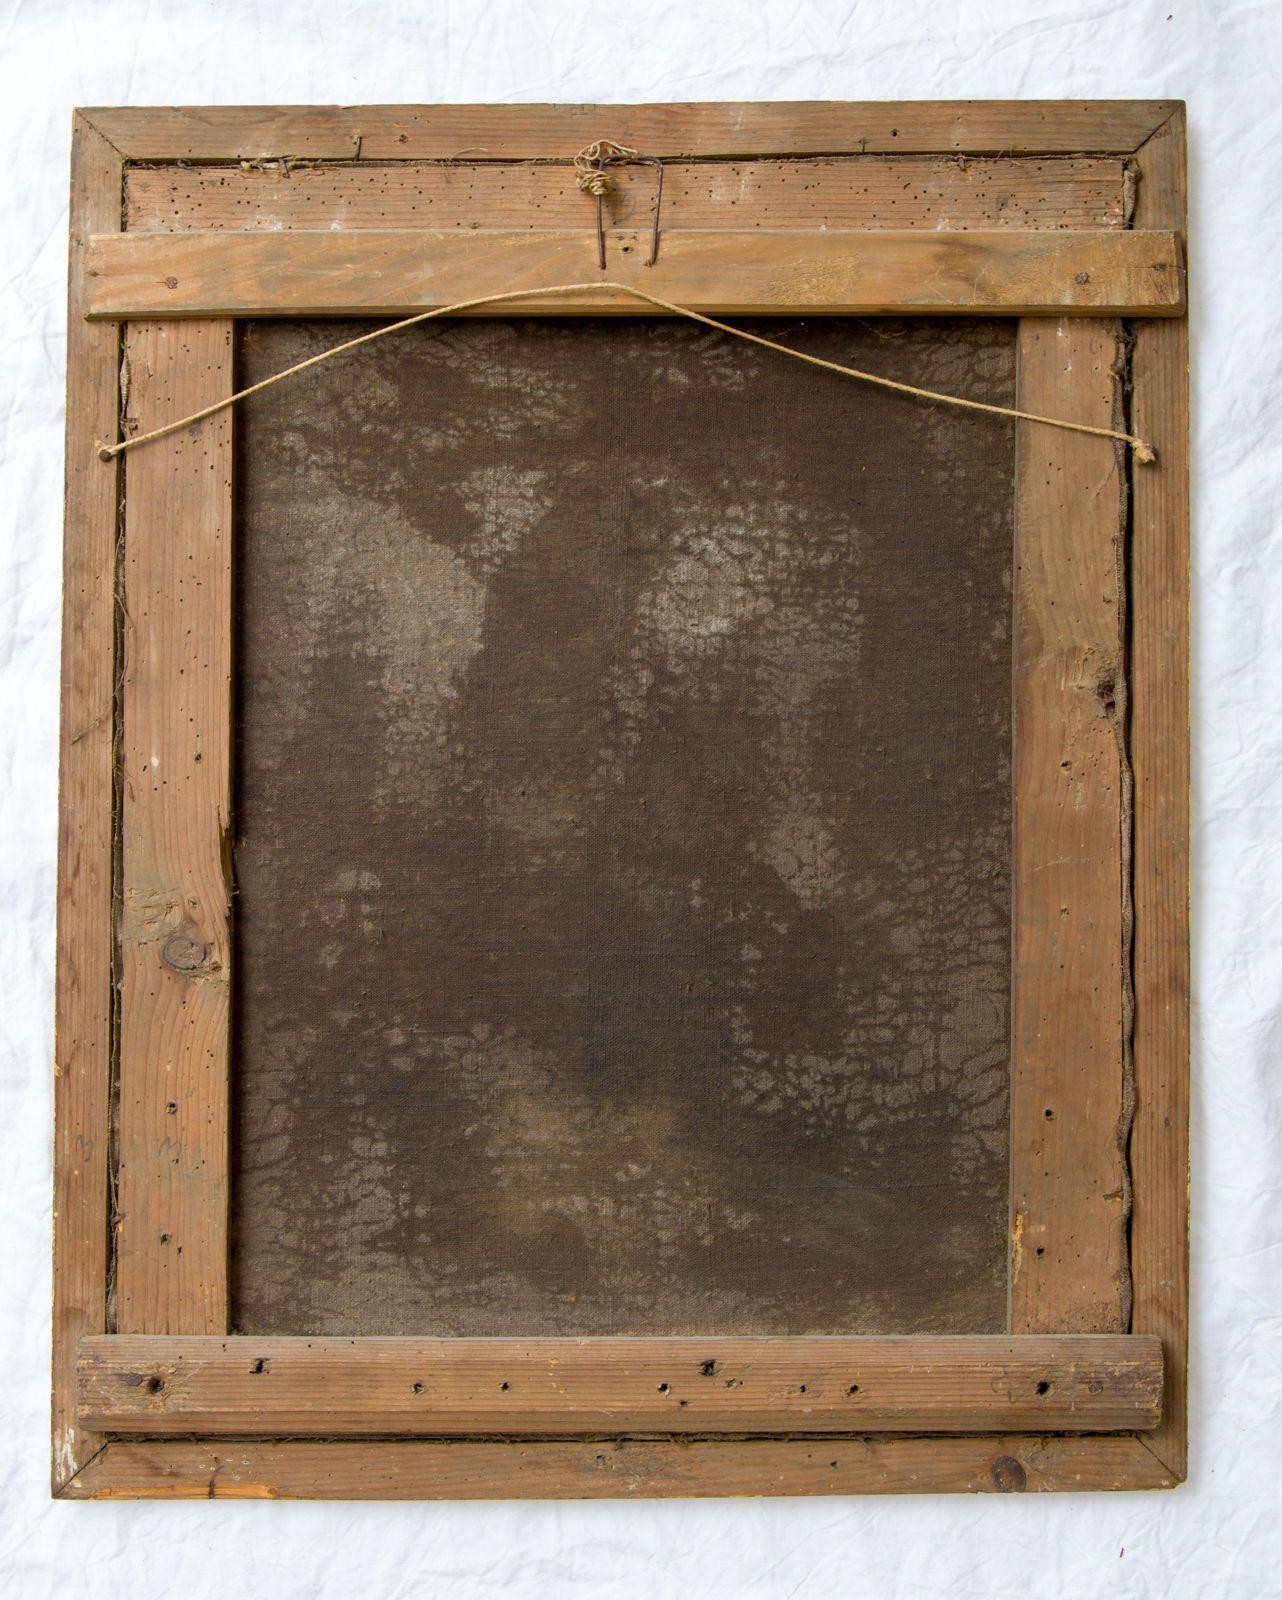 Antikes Barock Rokoko Gemälde Rahmen 18. Jahrhundert. Öl Leinwand ...